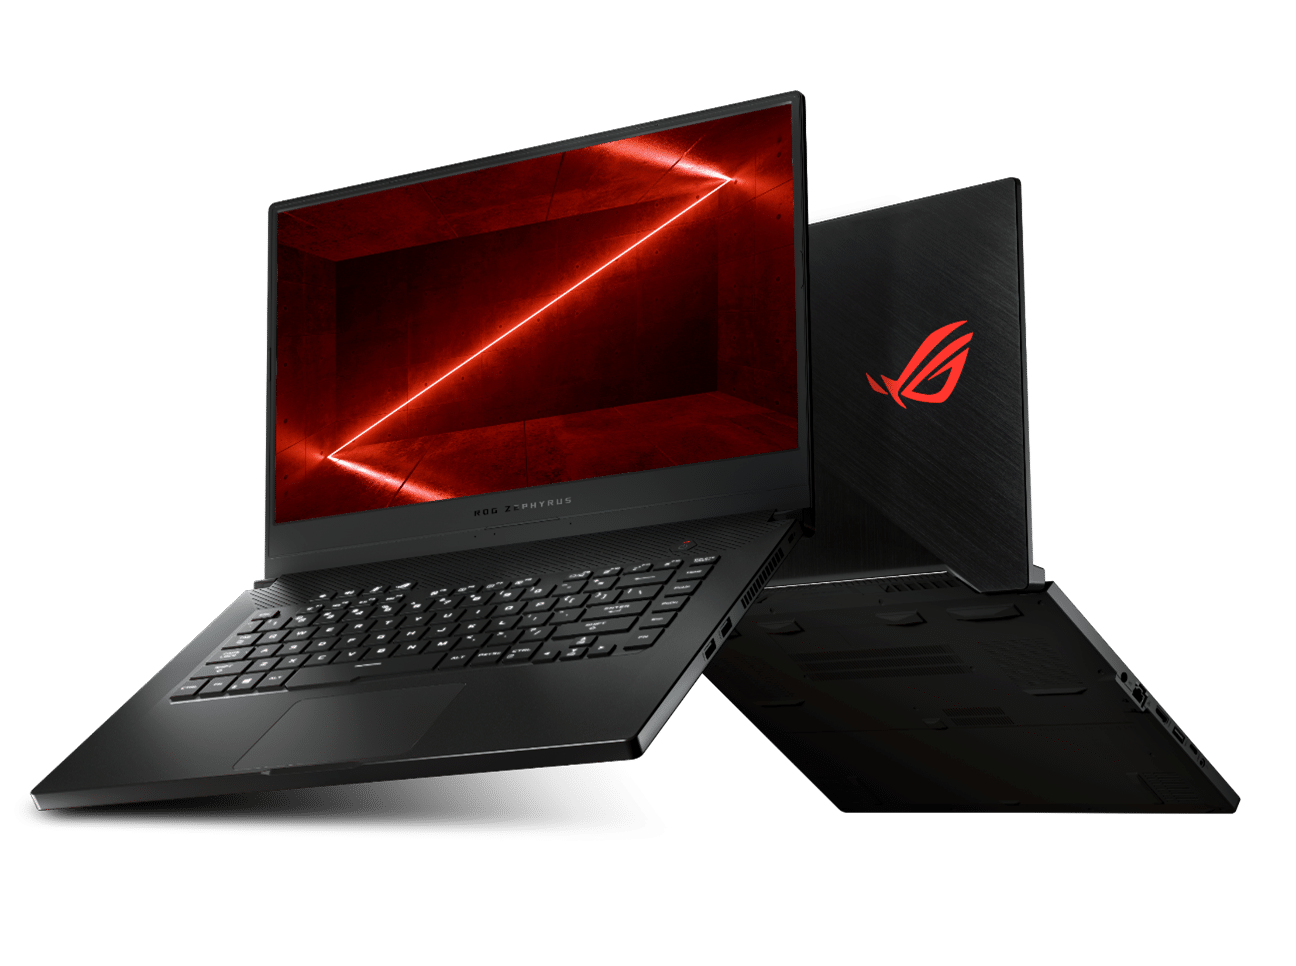 Asus ROG Zephyrus GA502, PC portable GTX 1660 Ti Max-Q + AMD Ryzen